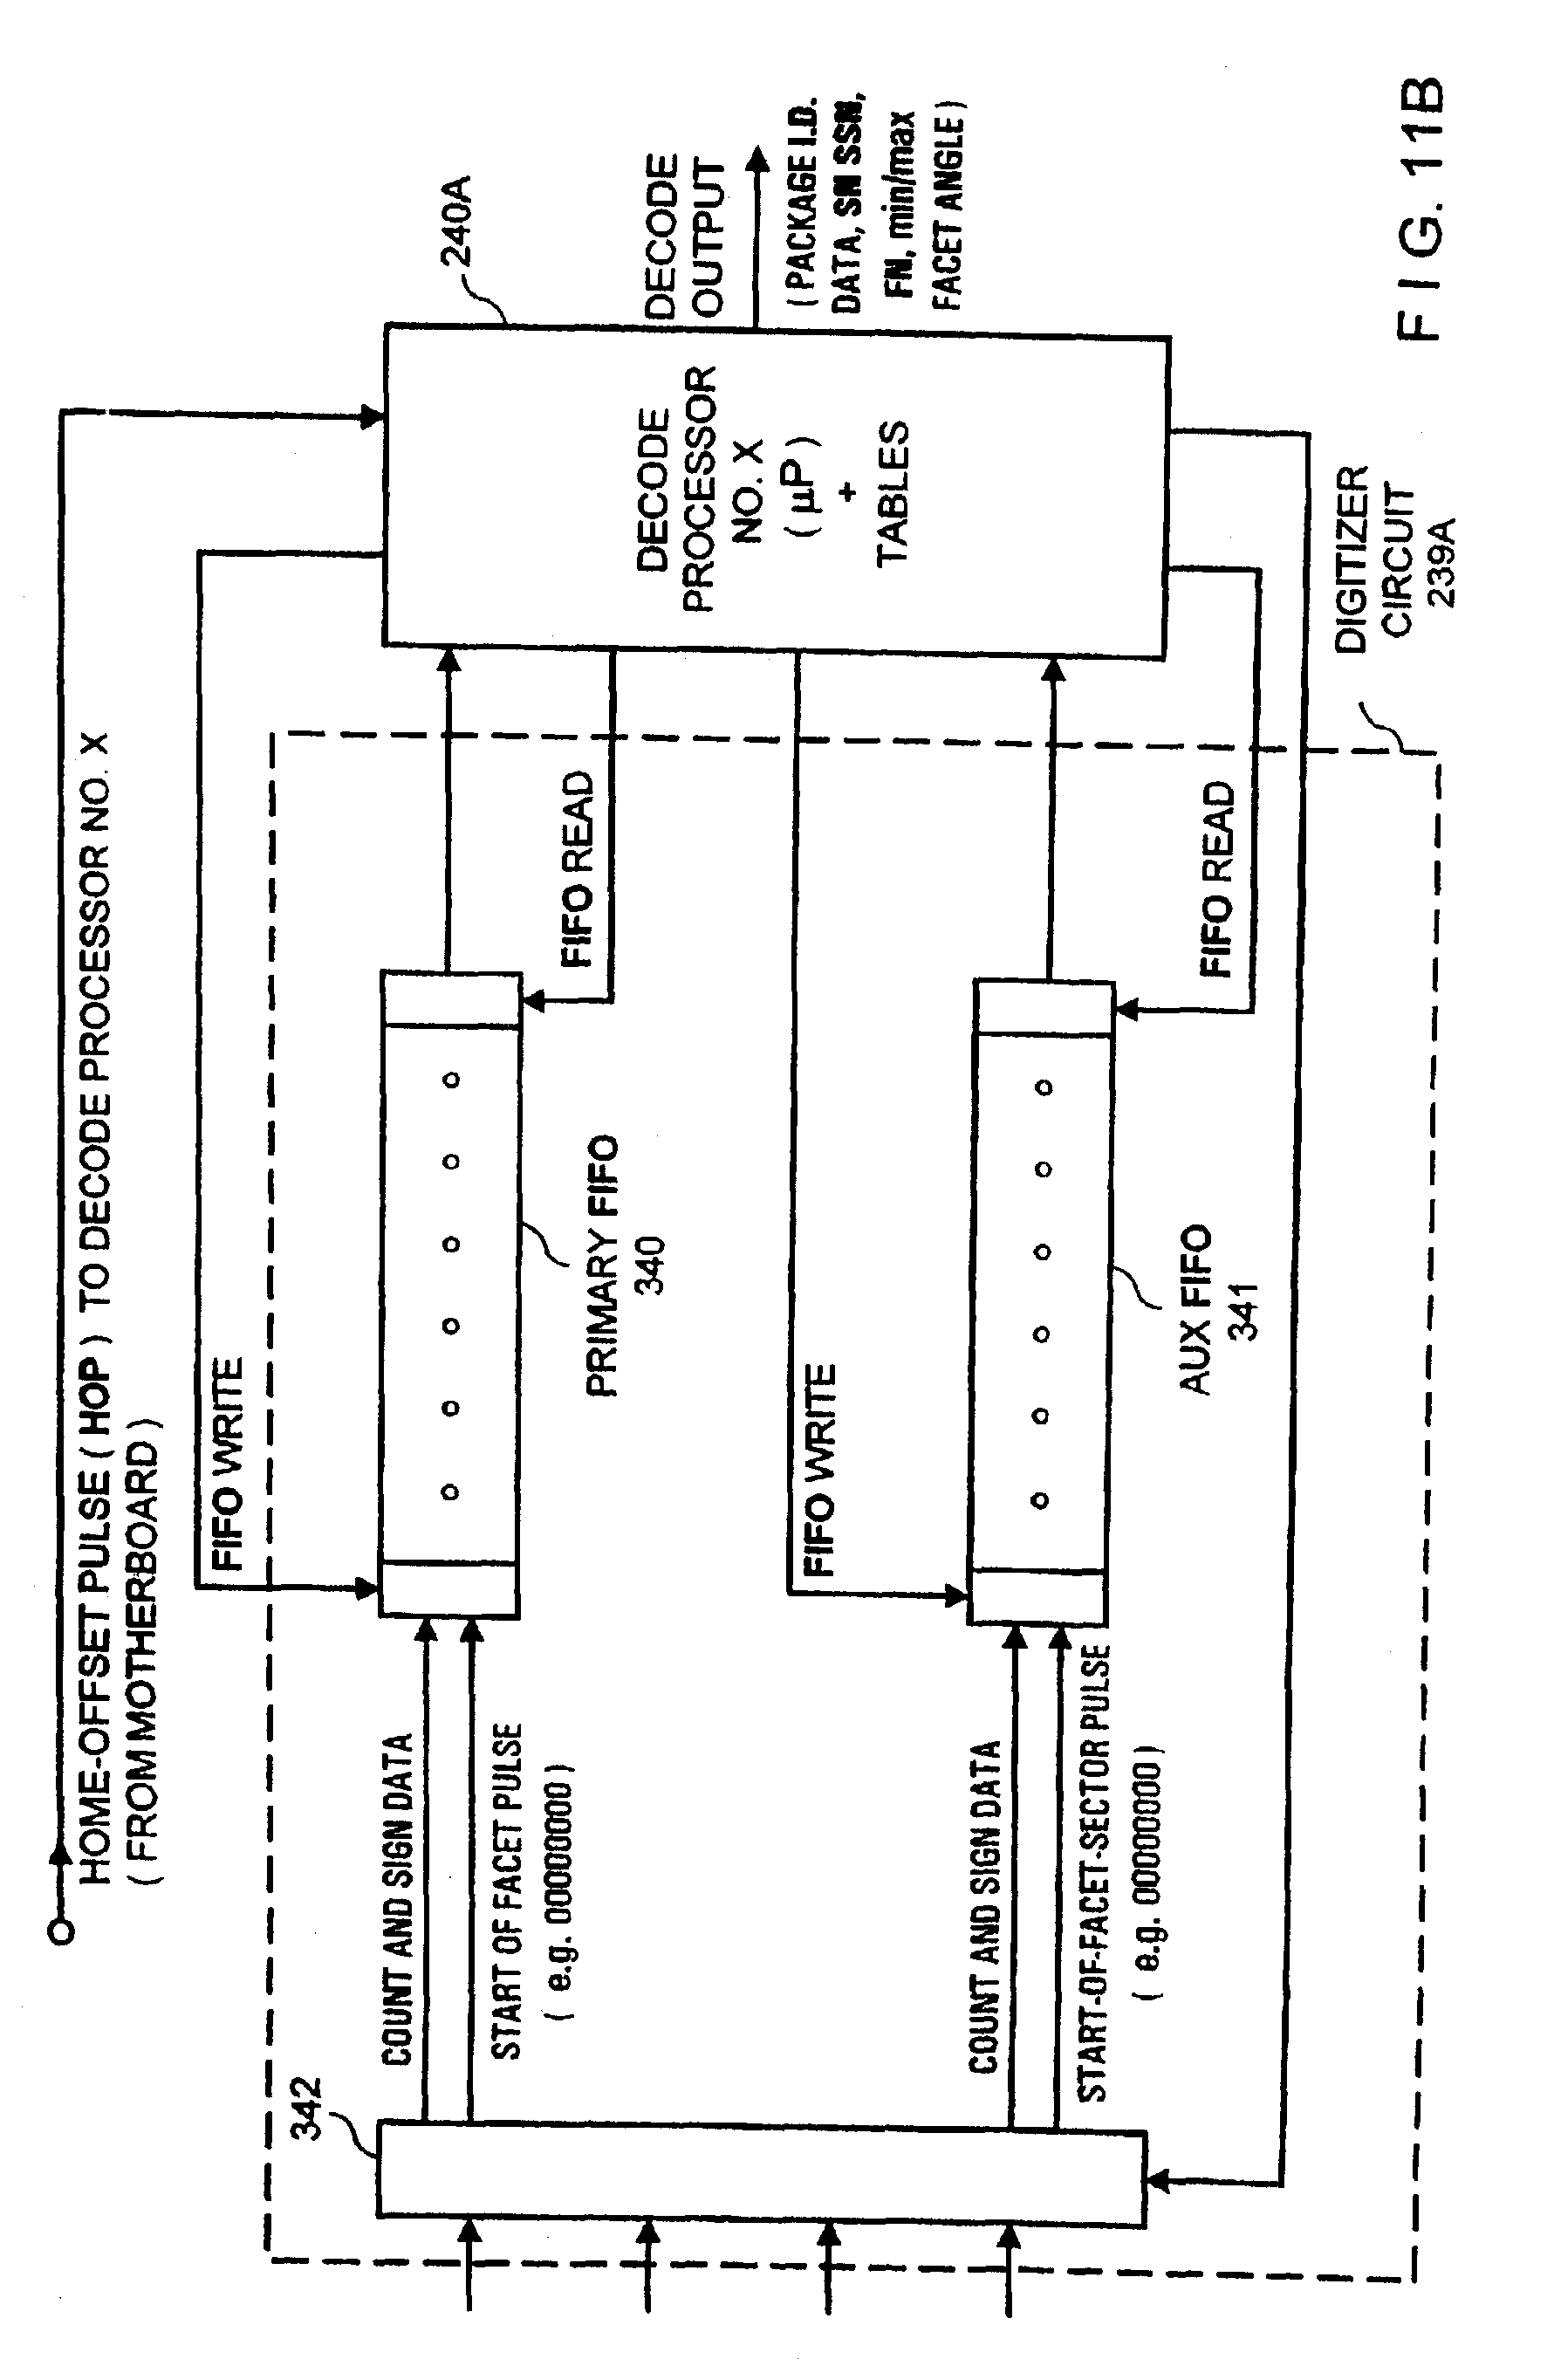 Patent Us 7104454 B2 Leddriven Led Display Circuit Design Powersupplycircuit Images